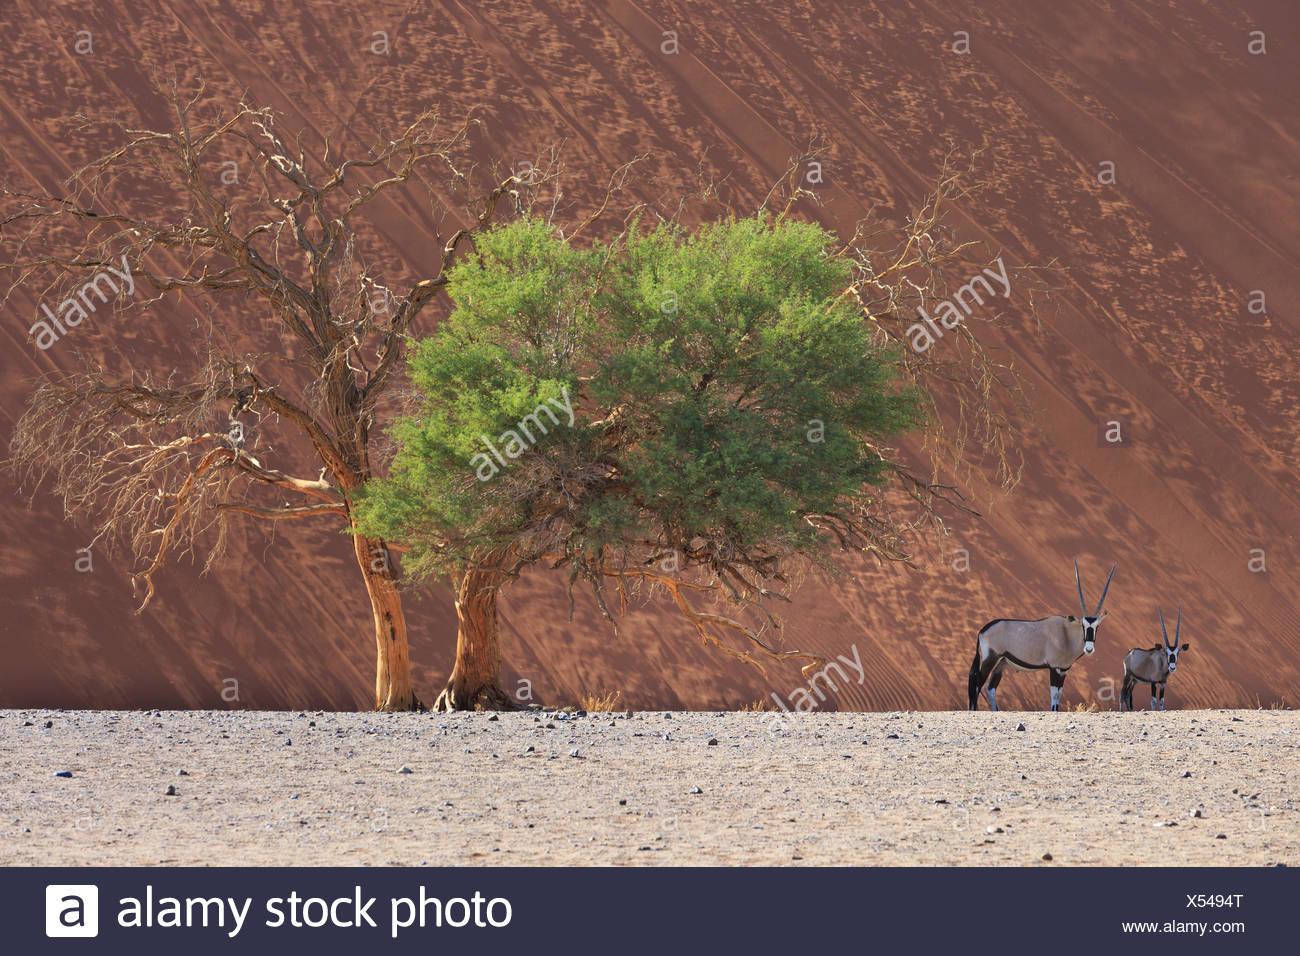 Sossusvlei, Namib Naukluft National Park, Namibia Stock Photo